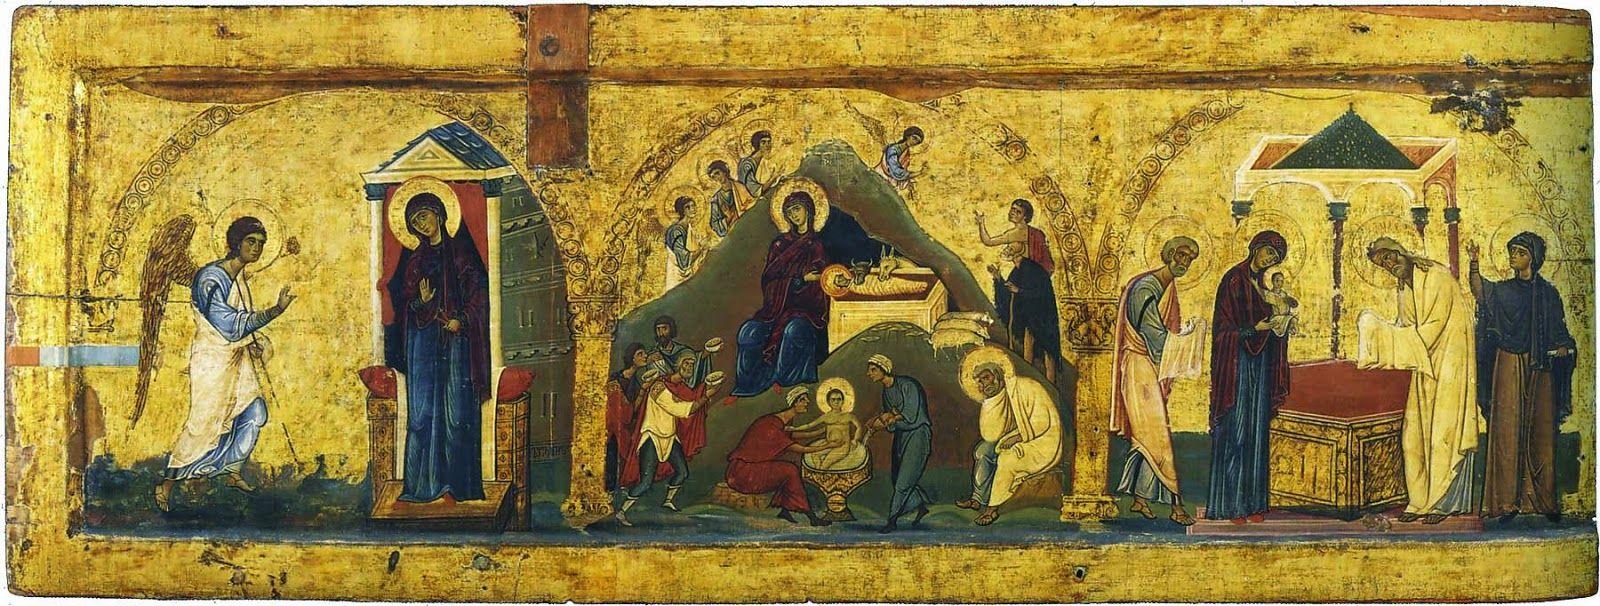 "MYSTAGOGY: ""On the Day of the Birth of Our Savior Jesus Christ"" by St. John Chrysostom"